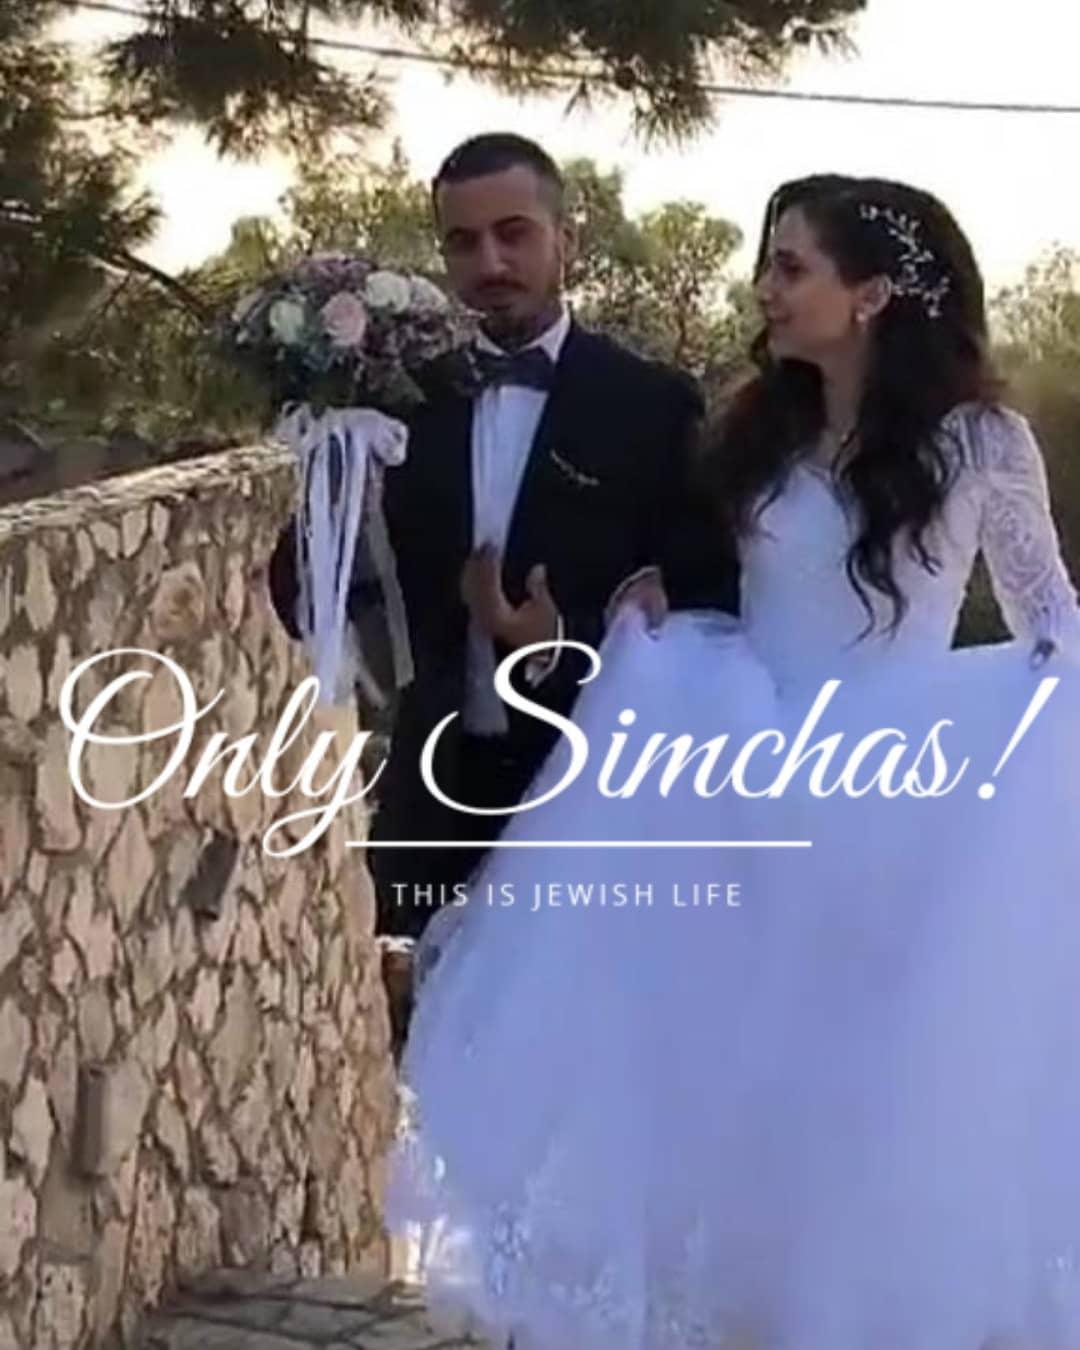 Wedding of Avi and Bertal! #Israel #onlysimchas ·